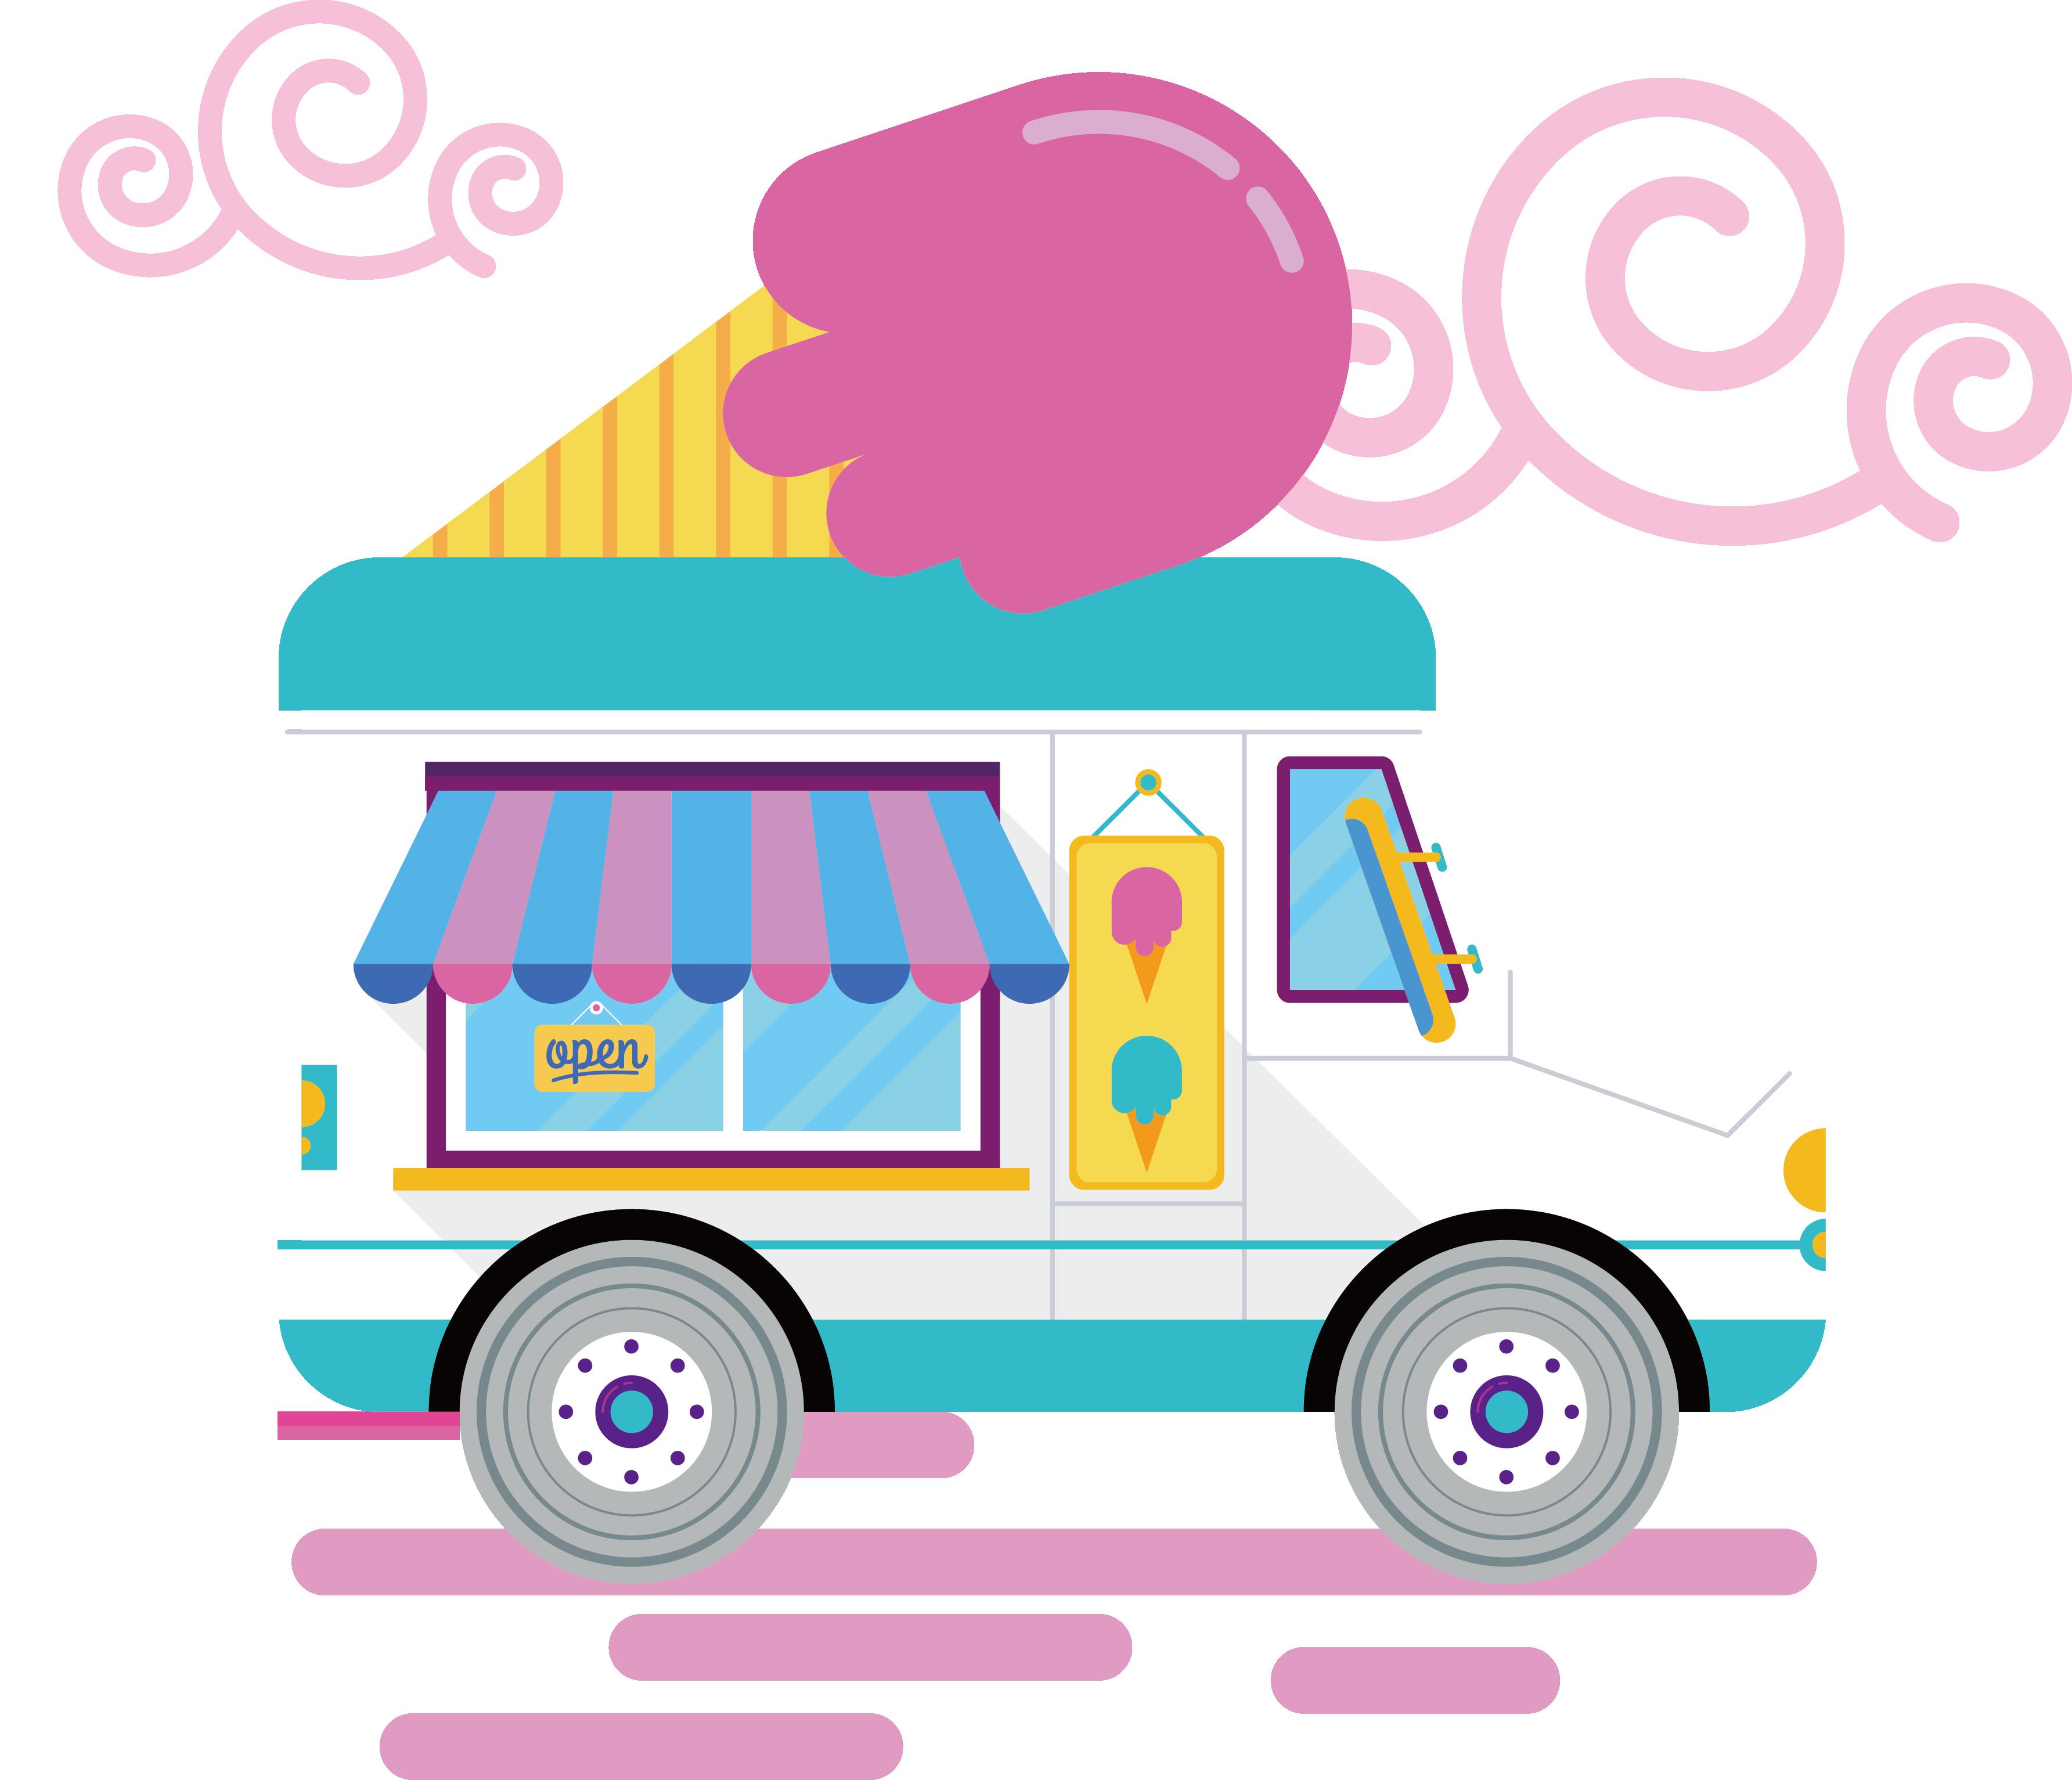 Driving clipart toy truck car. Ice cream van big